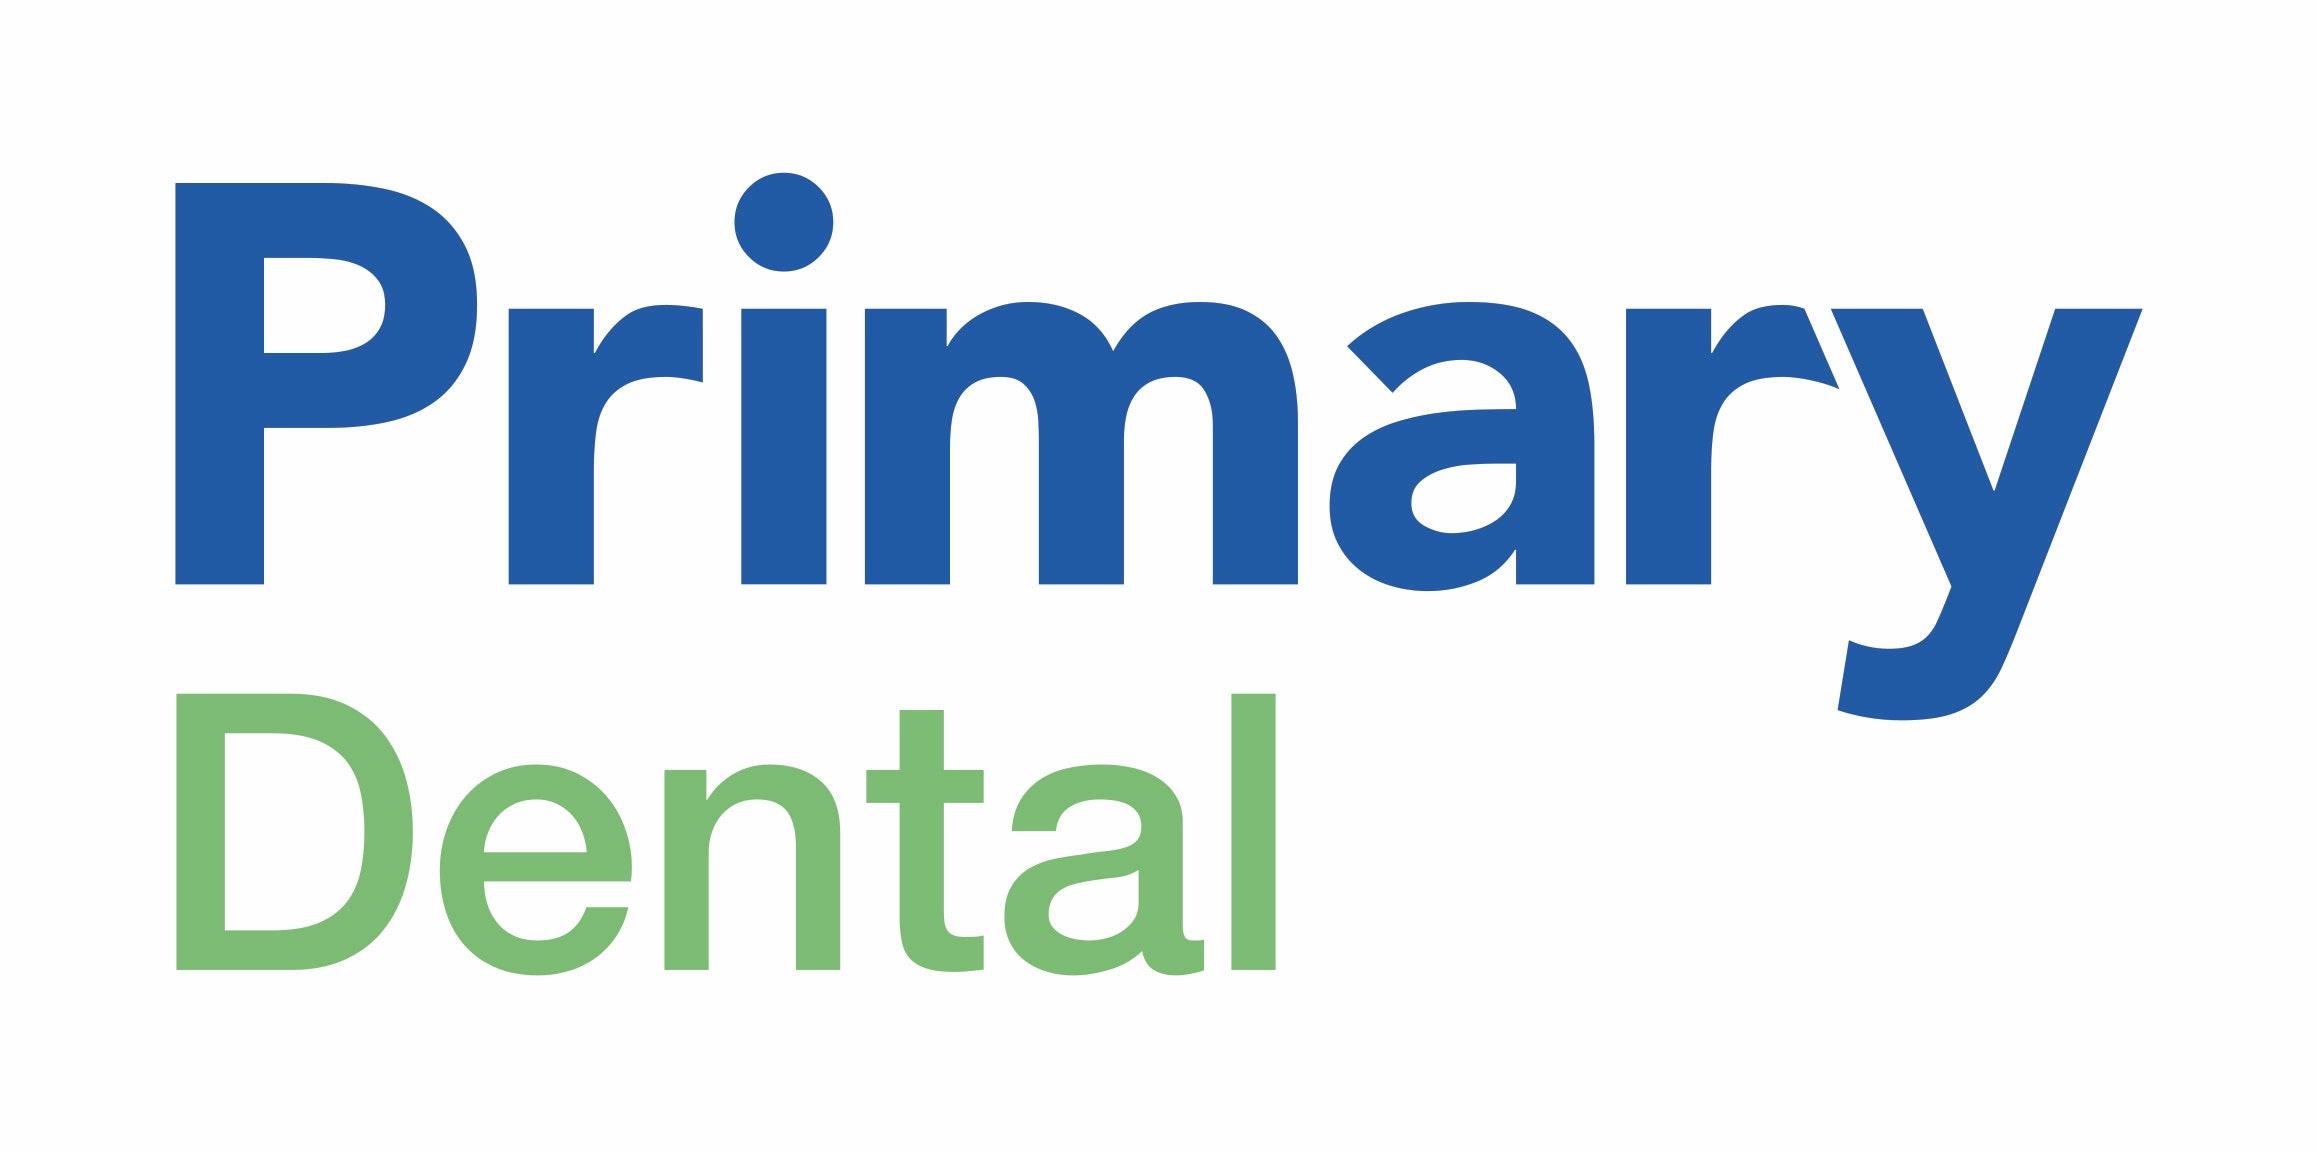 Primary Medical & Dental Centre Browns Plains